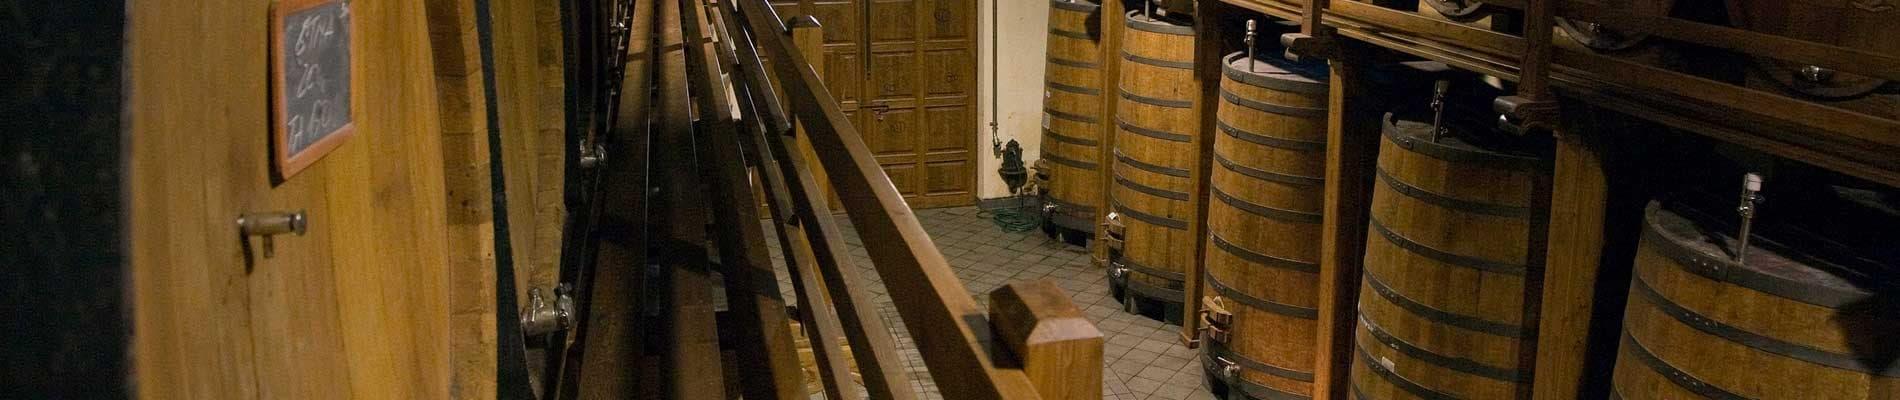 Enologia i viticultura